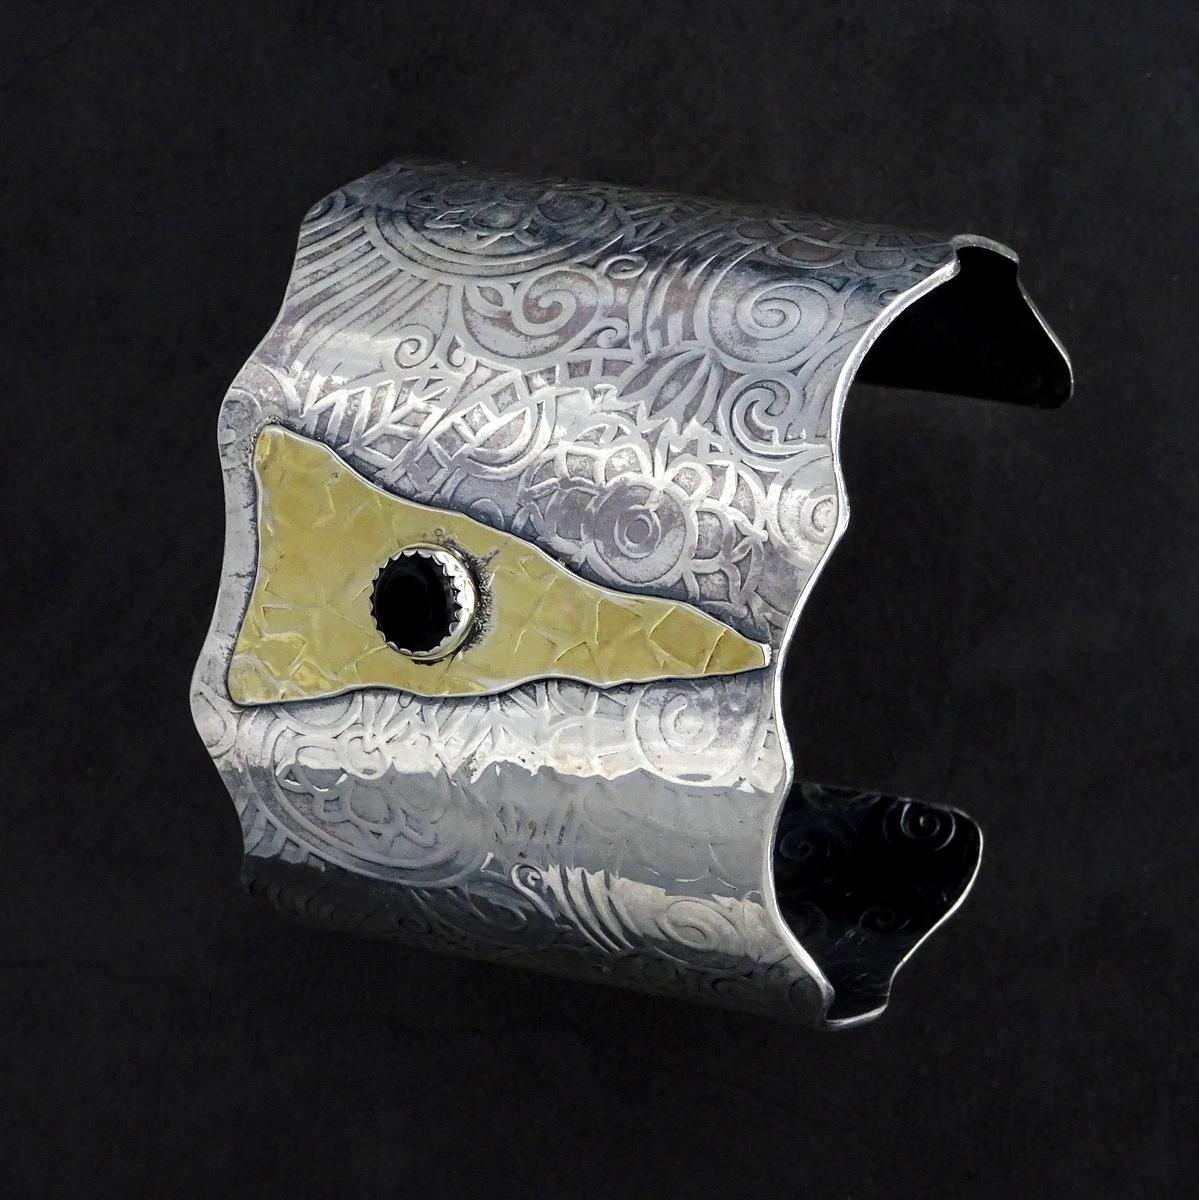 GOLDEN ARROW CUFF BRACELET,  2.25 inches high x 2.5 inches in diameter